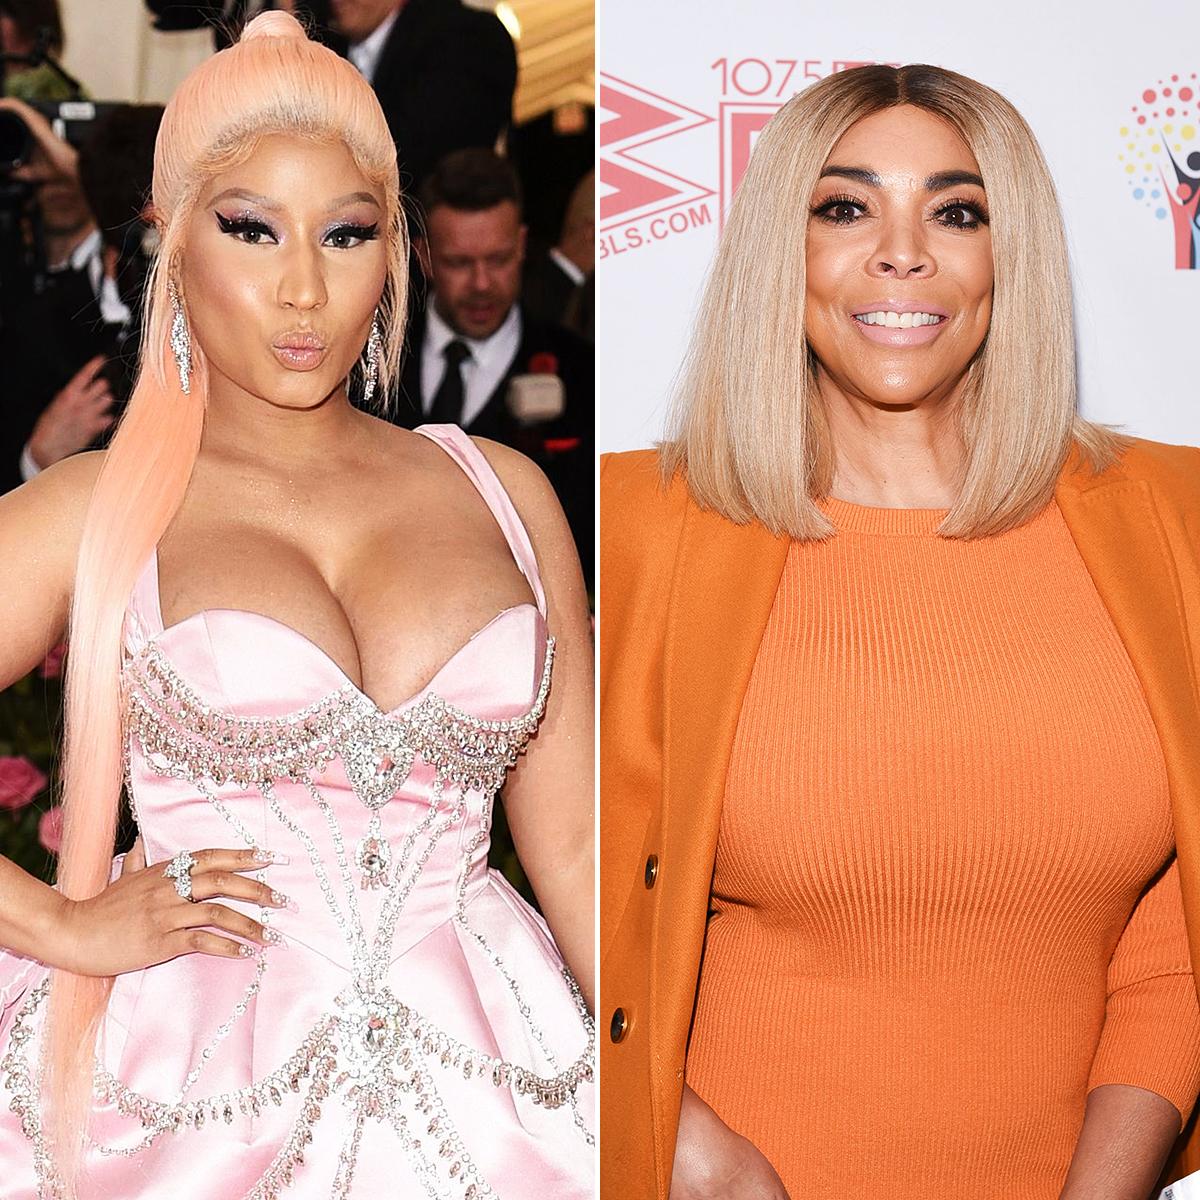 Nicki-Minaj-Thanks-Wendy-Williams-for-Supporting-Her-Relationship